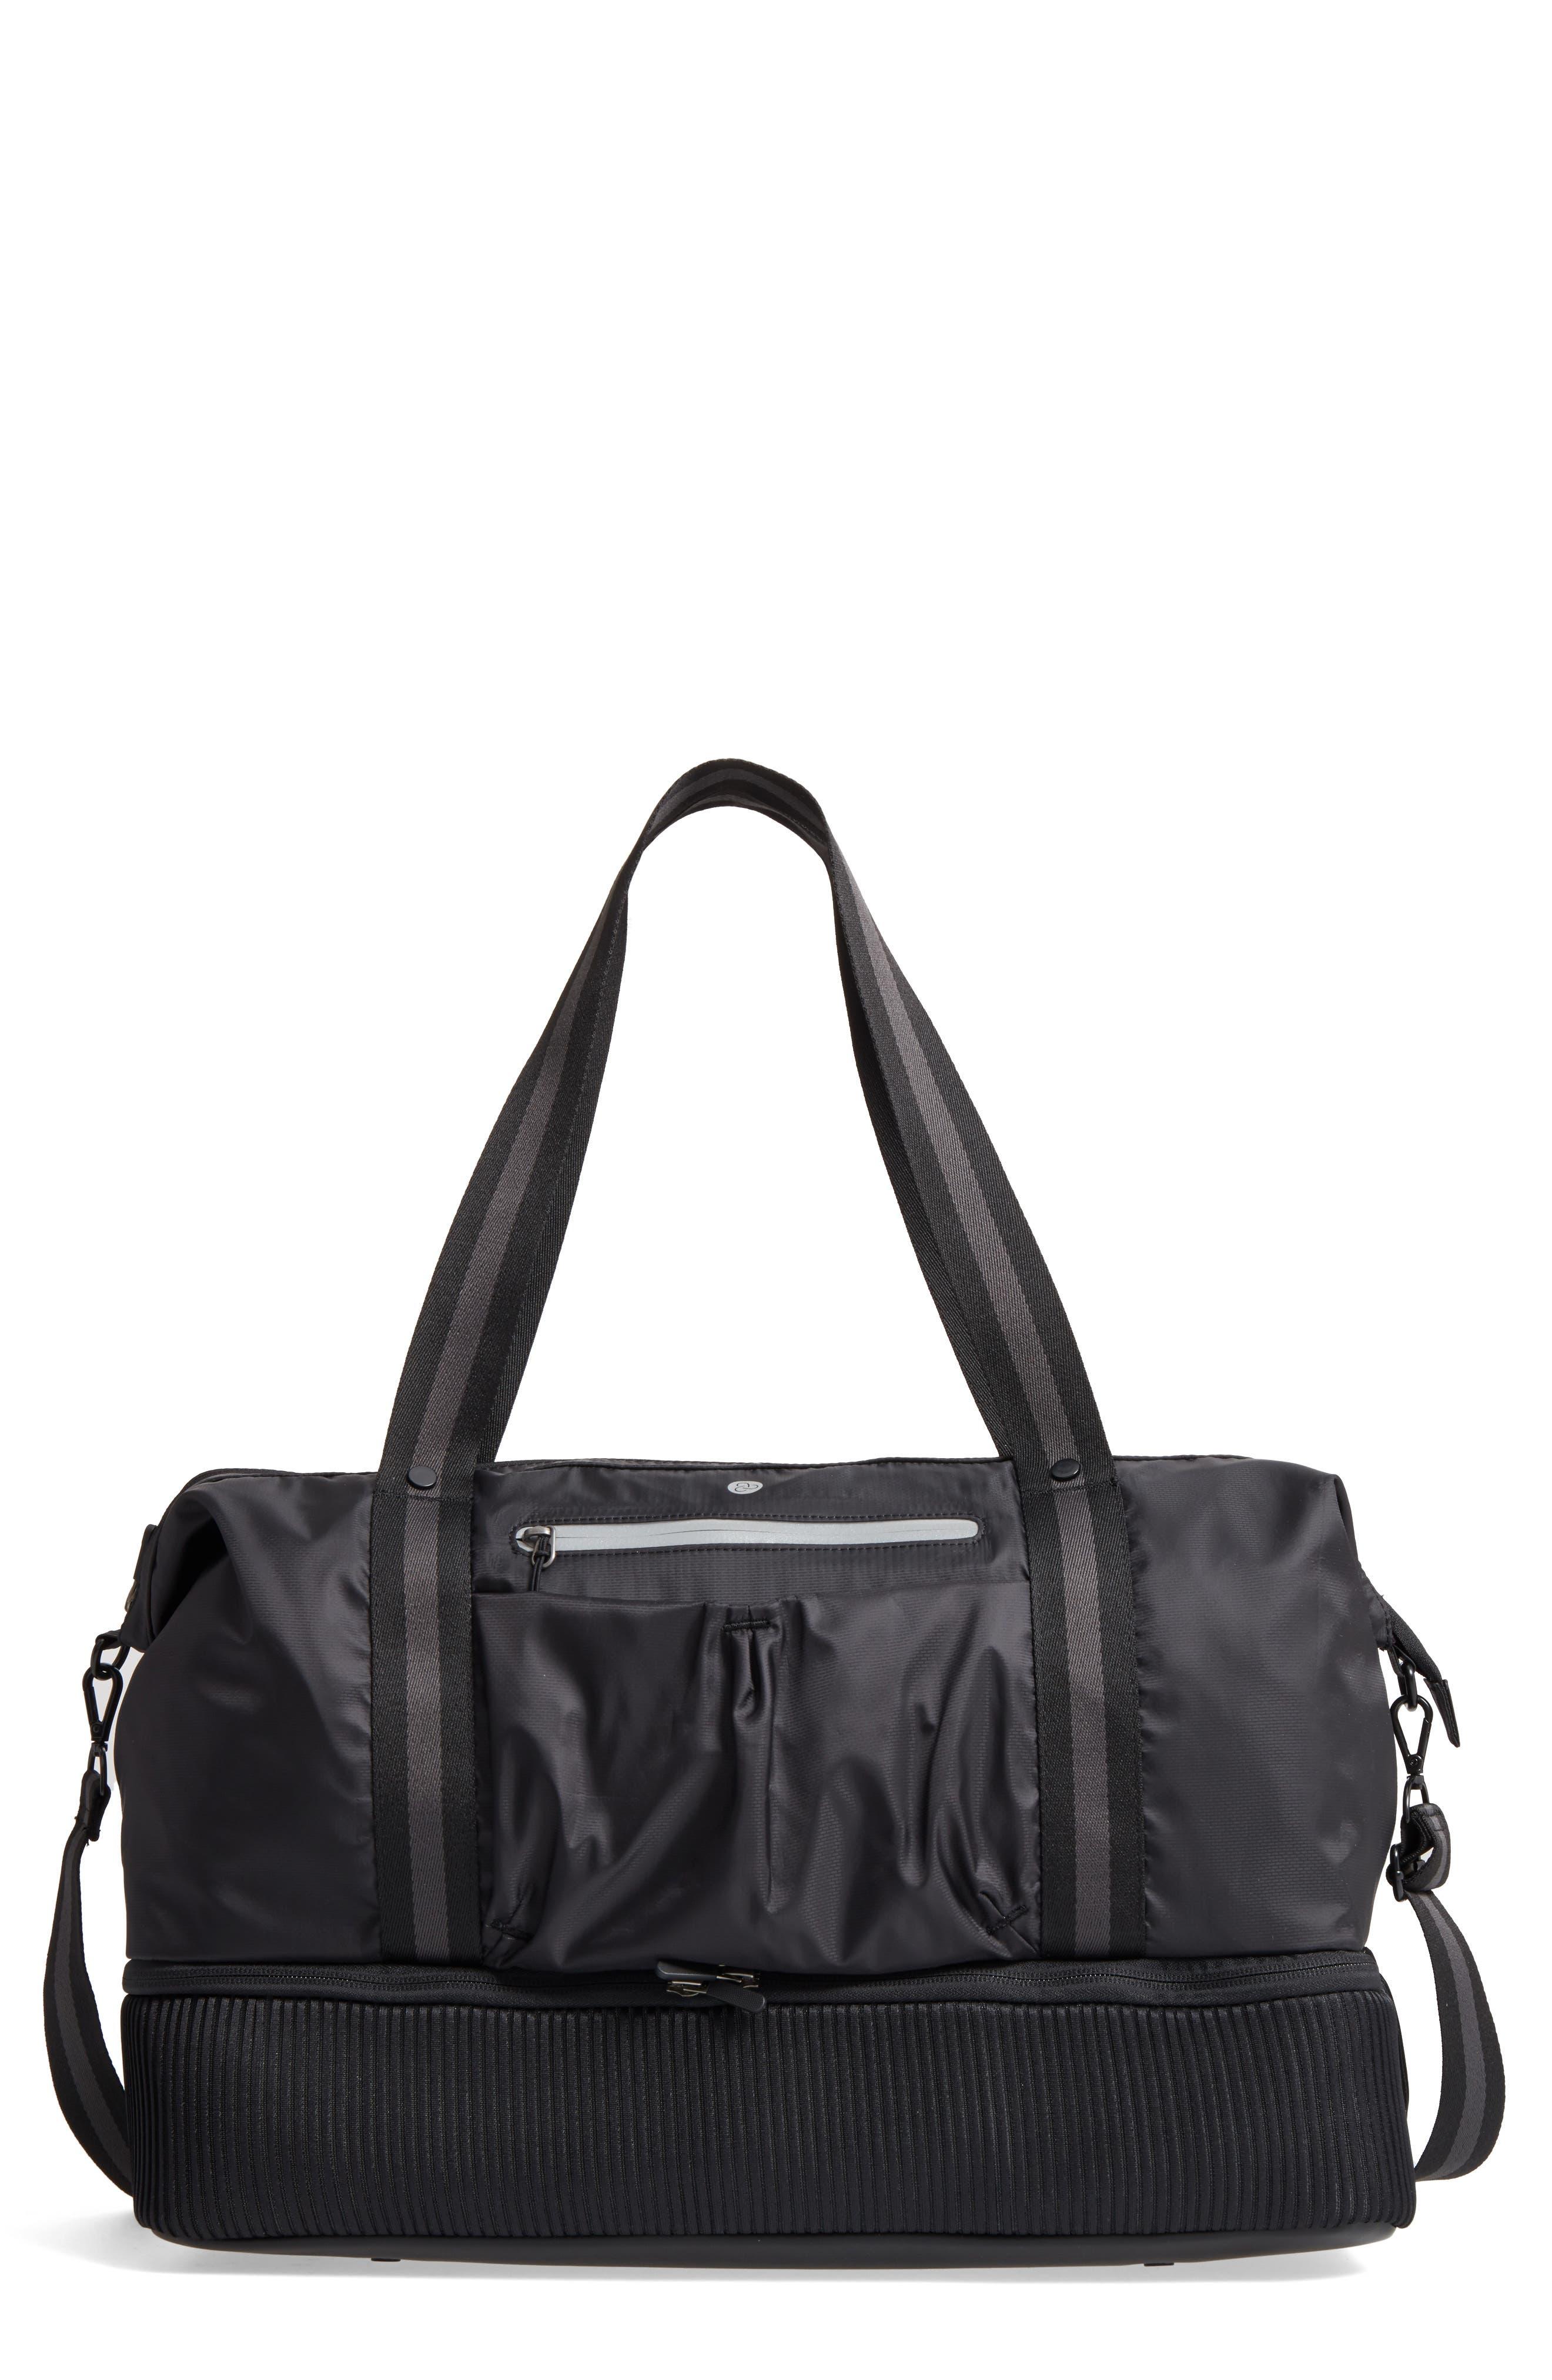 Main Image - Zella Alcove Duffel Bag